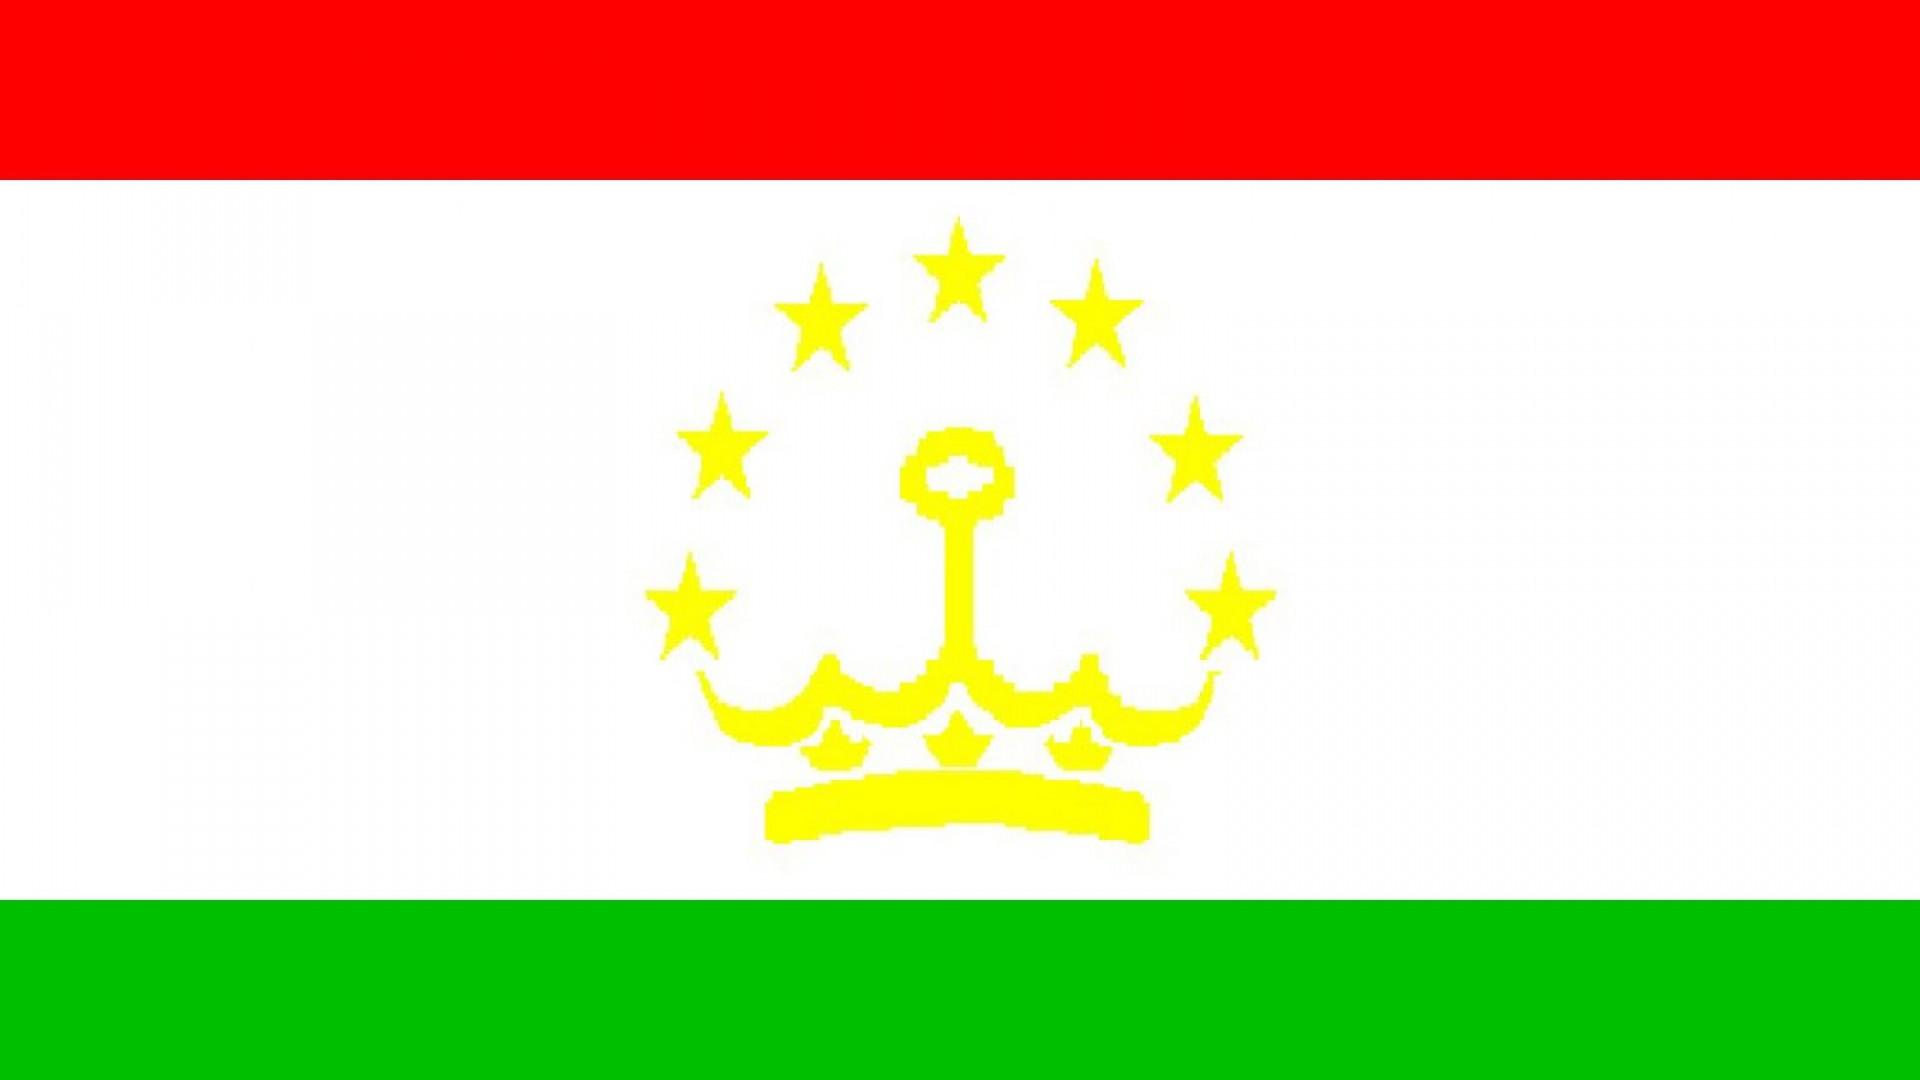 Tajikistan Flag   Wallpaper High Definition High Quality Widescreen 1920x1080